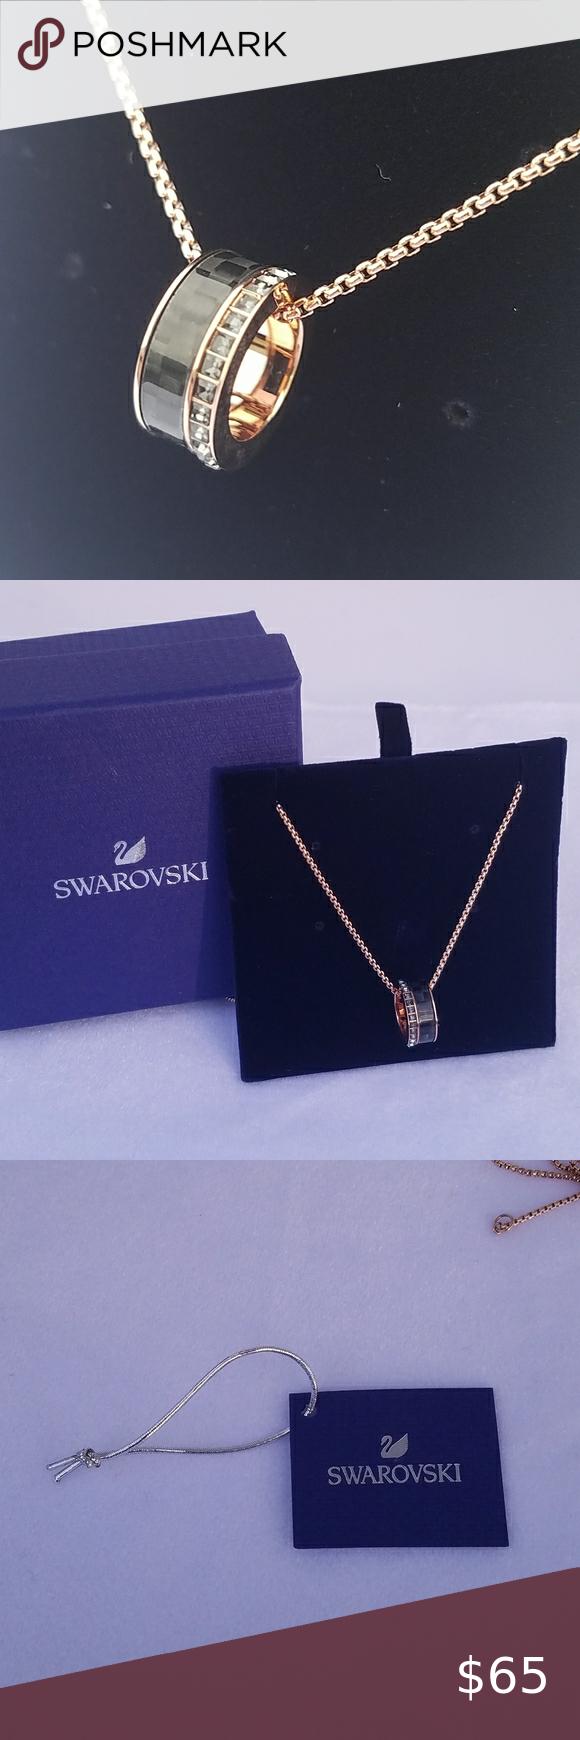 28+ Where can i sell my swarovski jewelry ideas